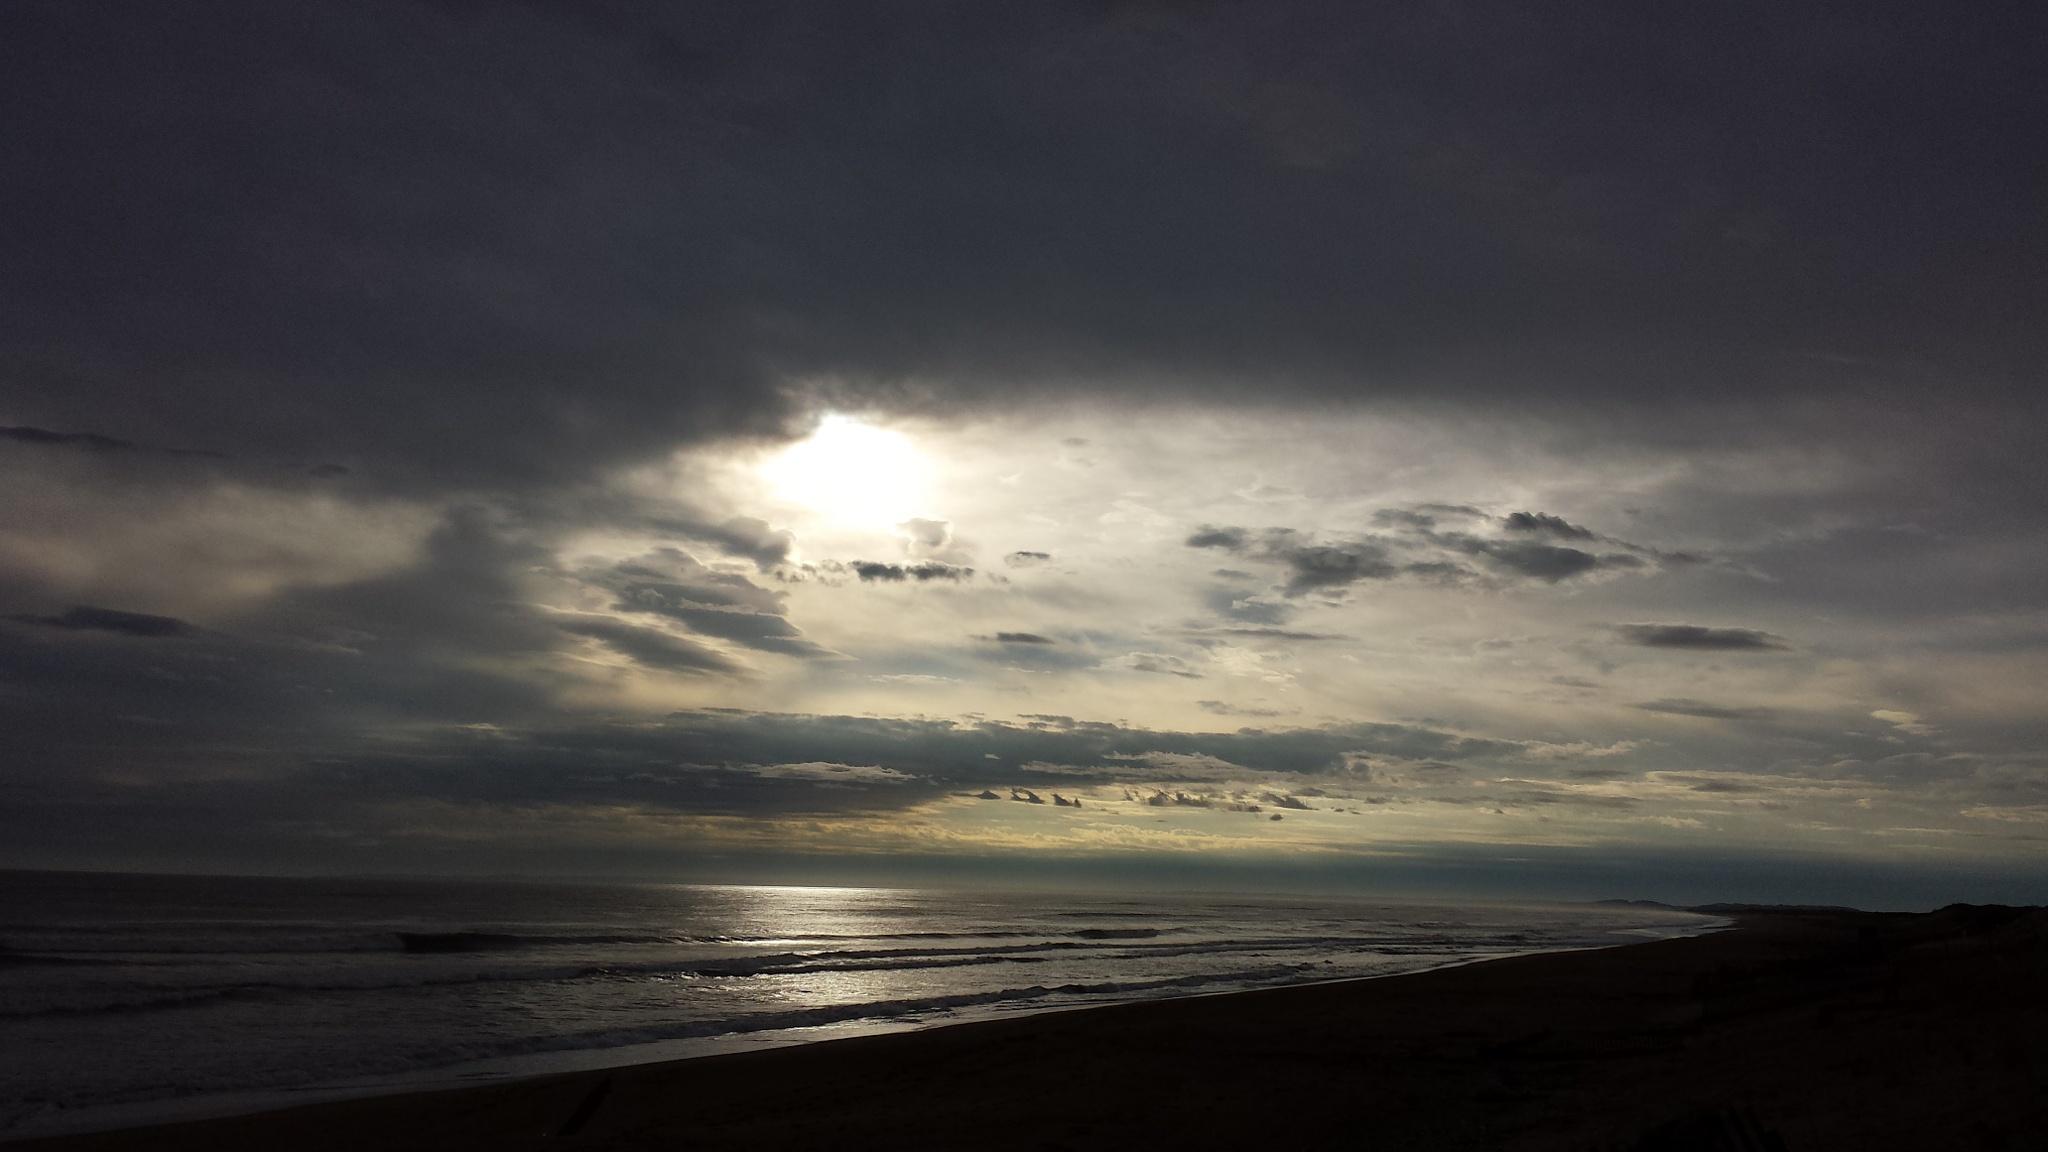 Sun Peeking Through... by Cary J.Casse